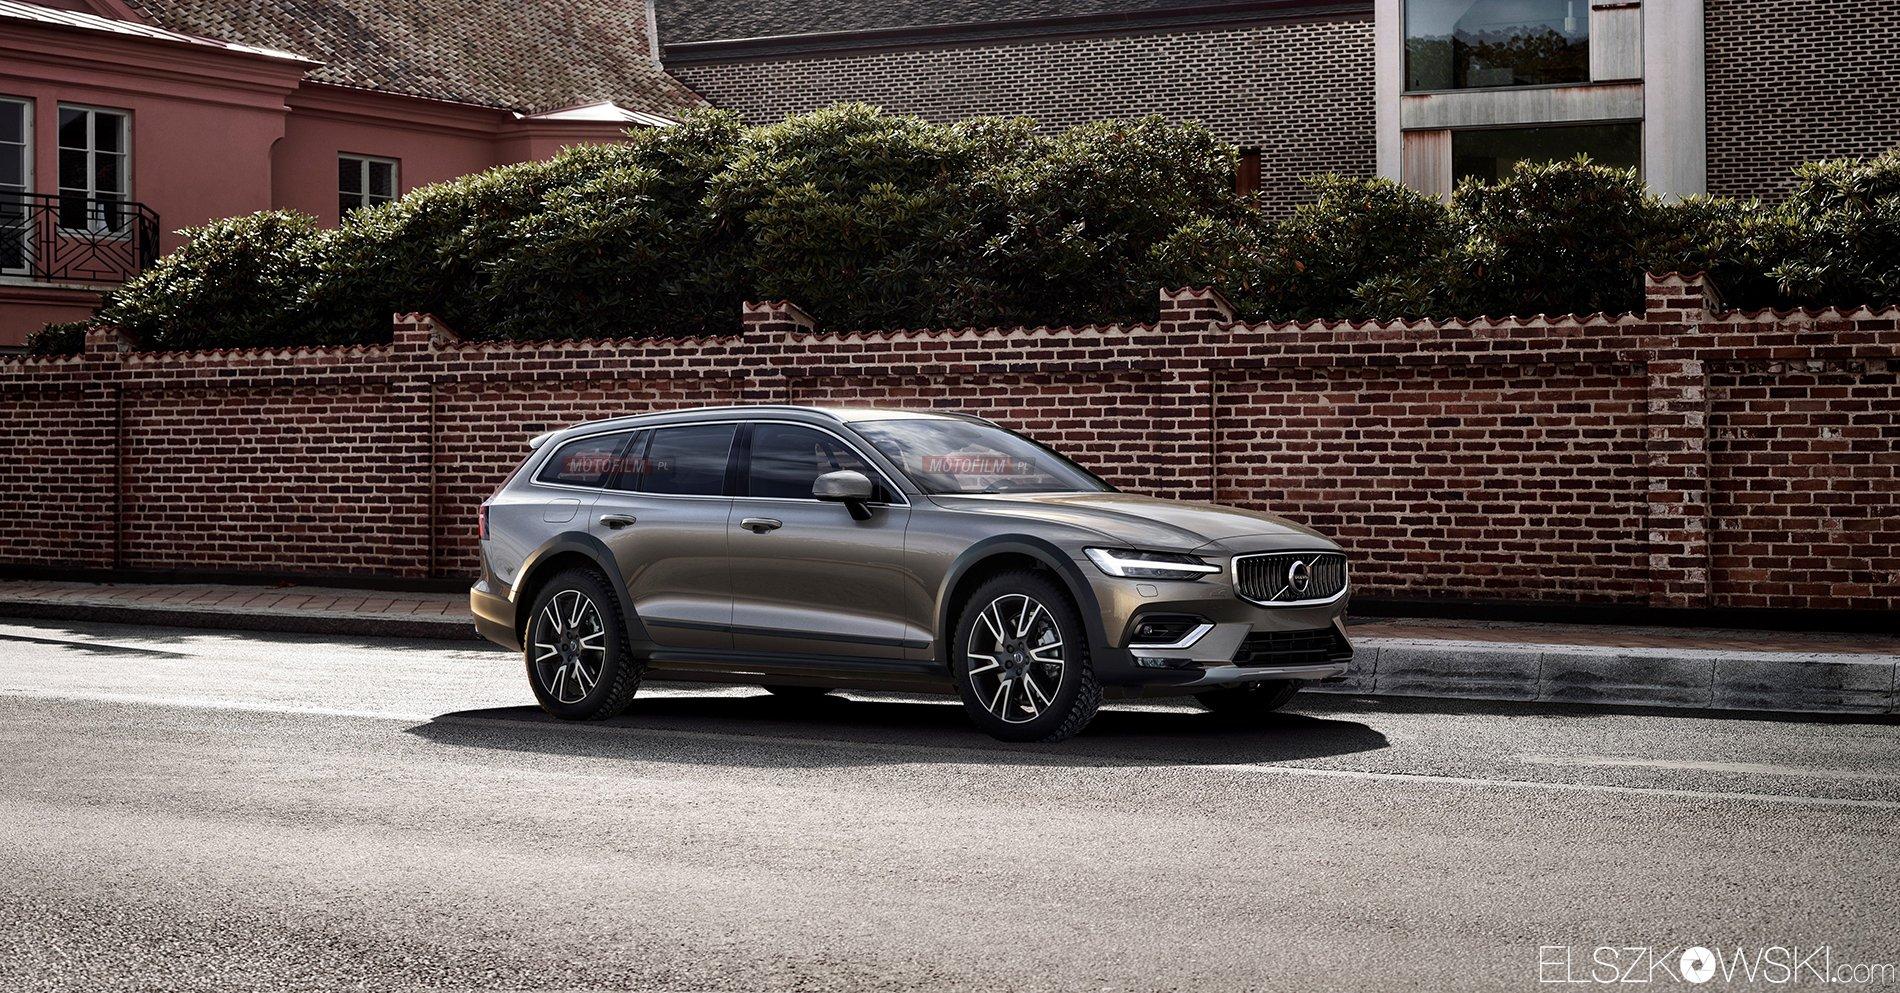 Volvo V60 Cross Country Rendering